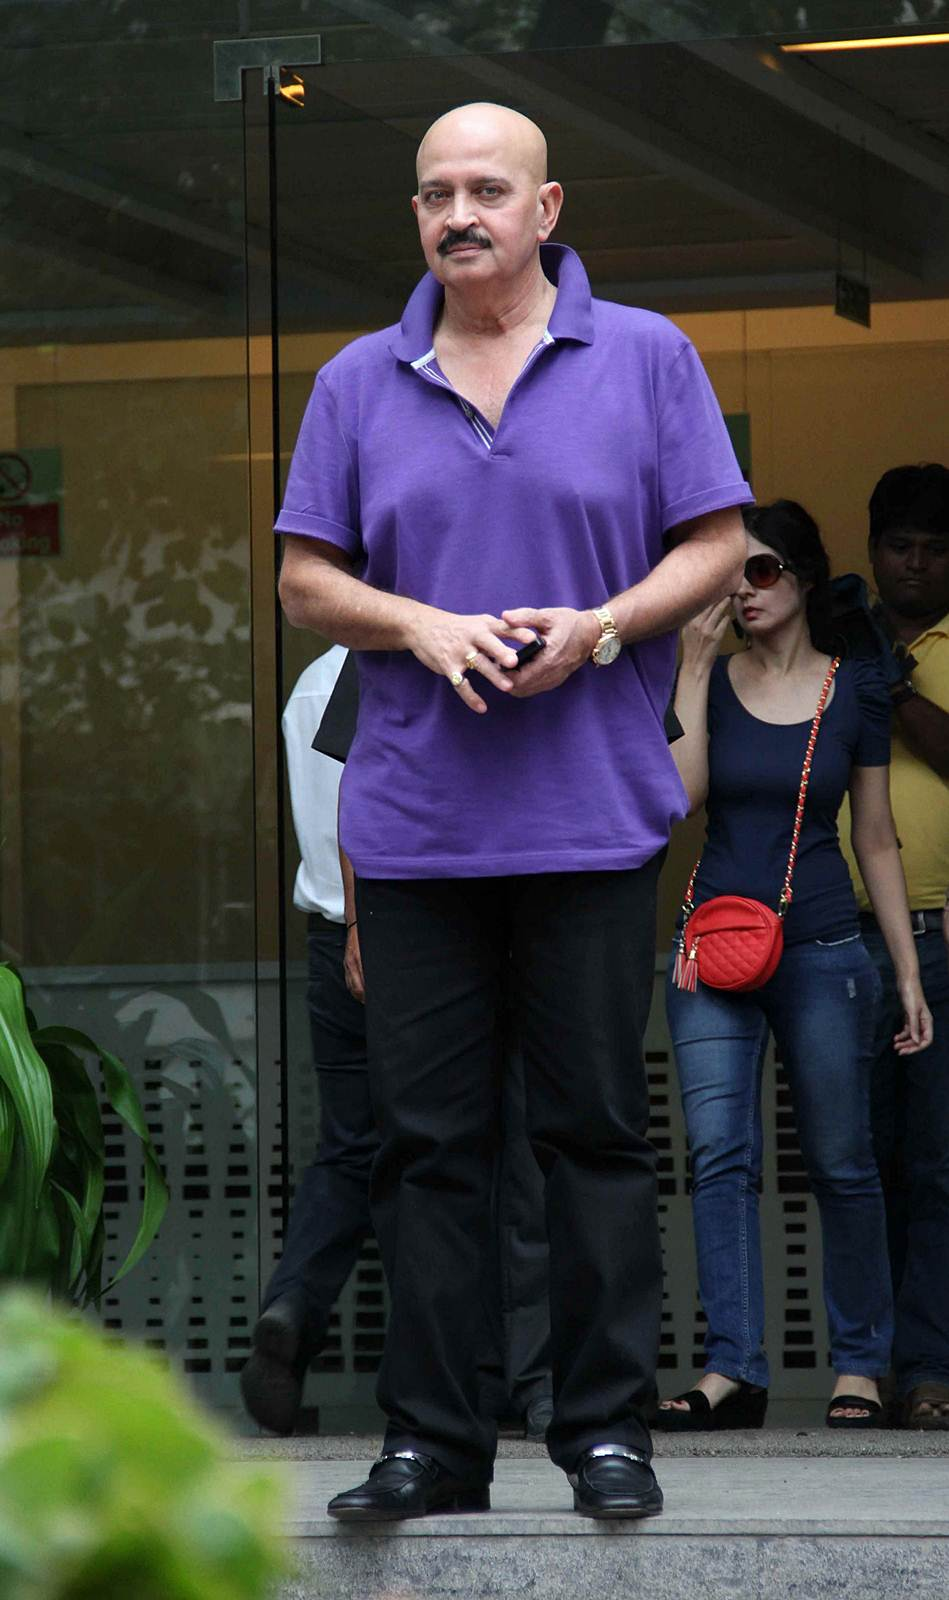 Rakesh Roshan - Celebs to meet Hirthik Roshan after brain surgery Photos | Picture 504152